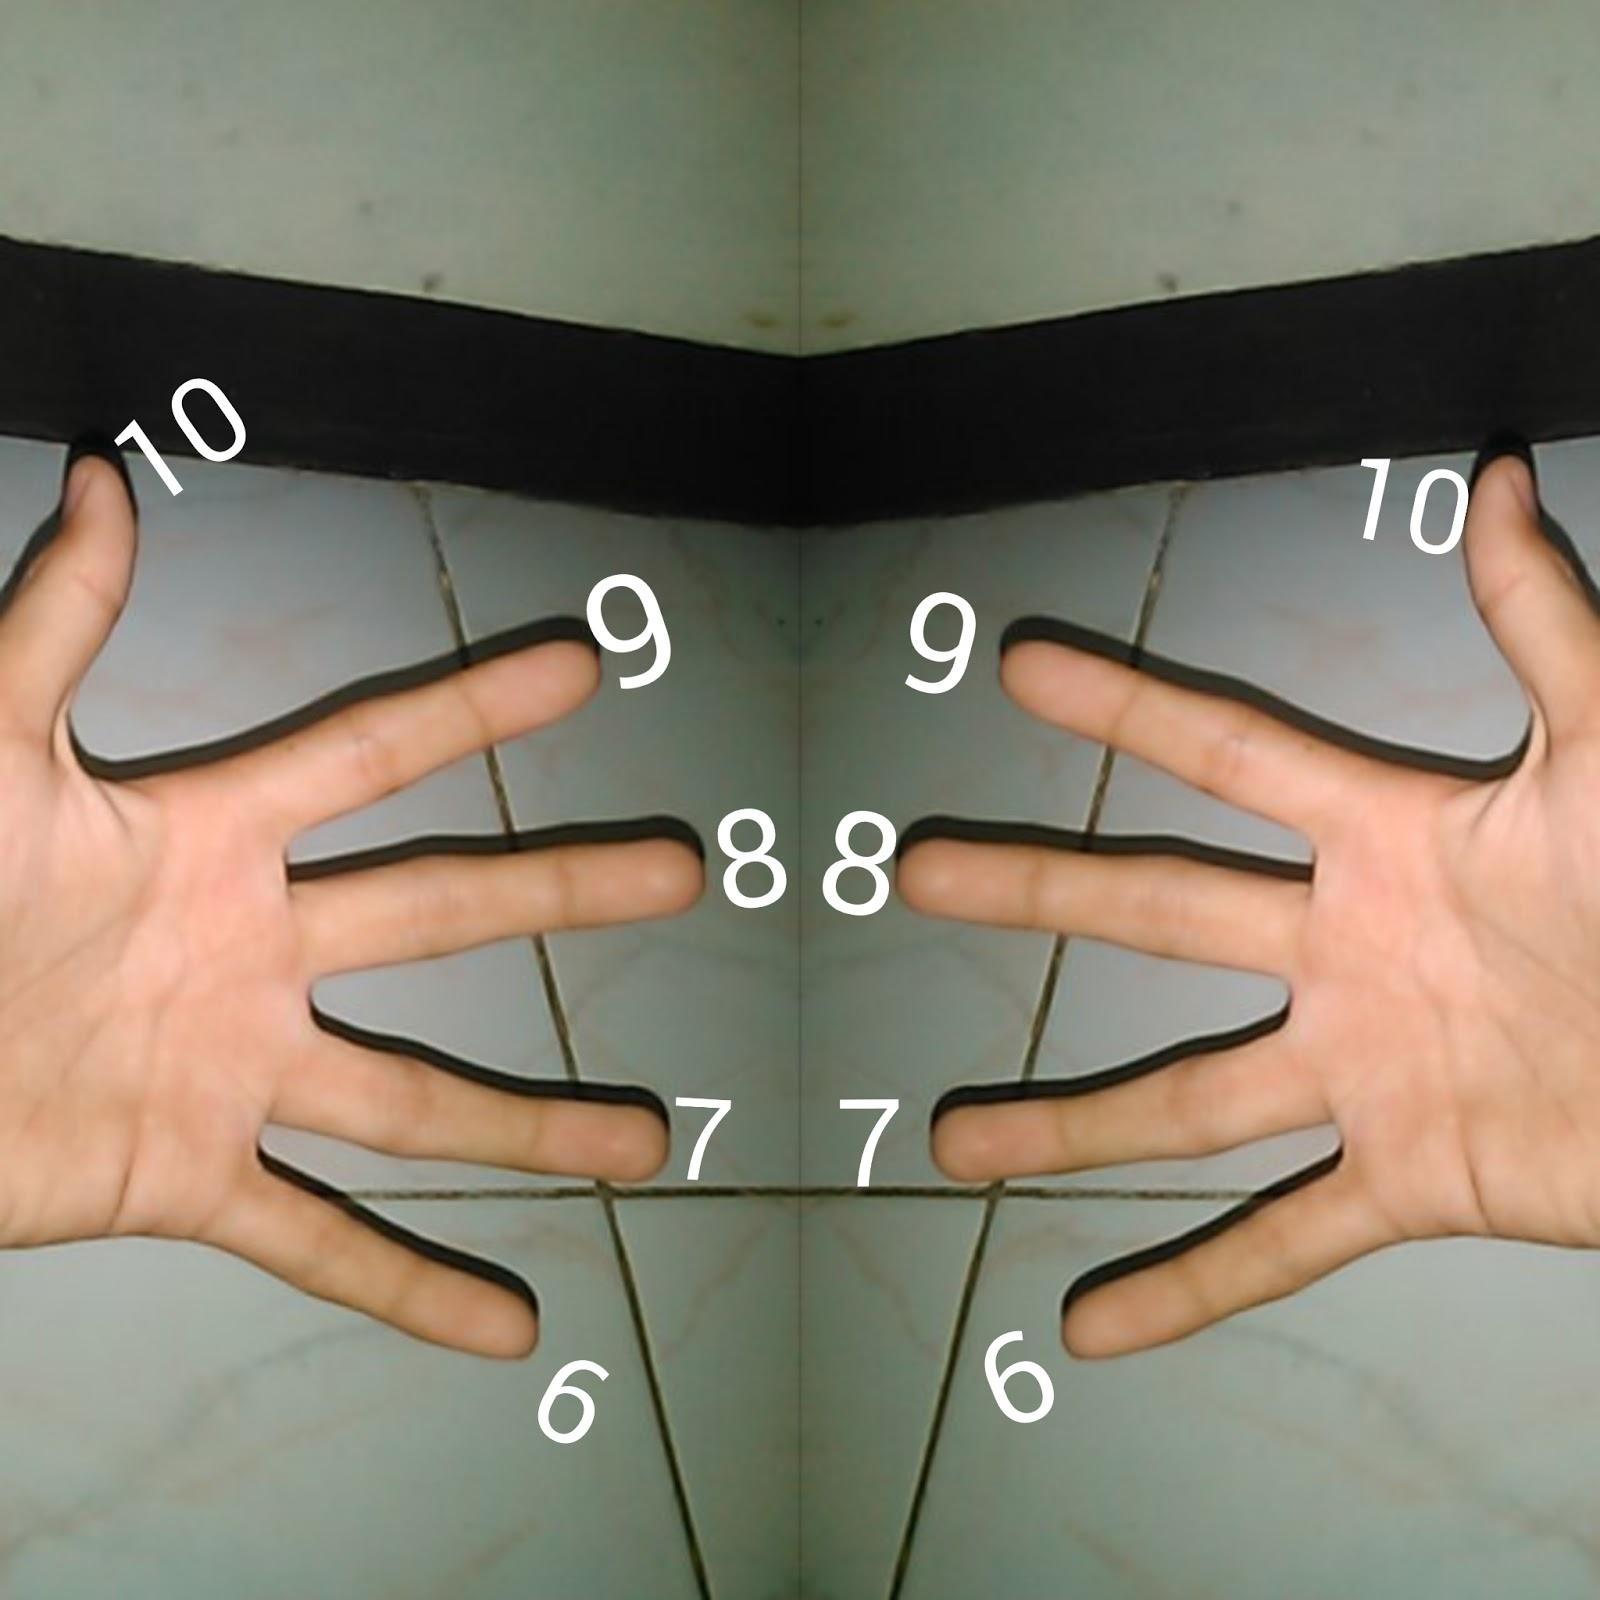 tandai jari dengan angka seperti gambar